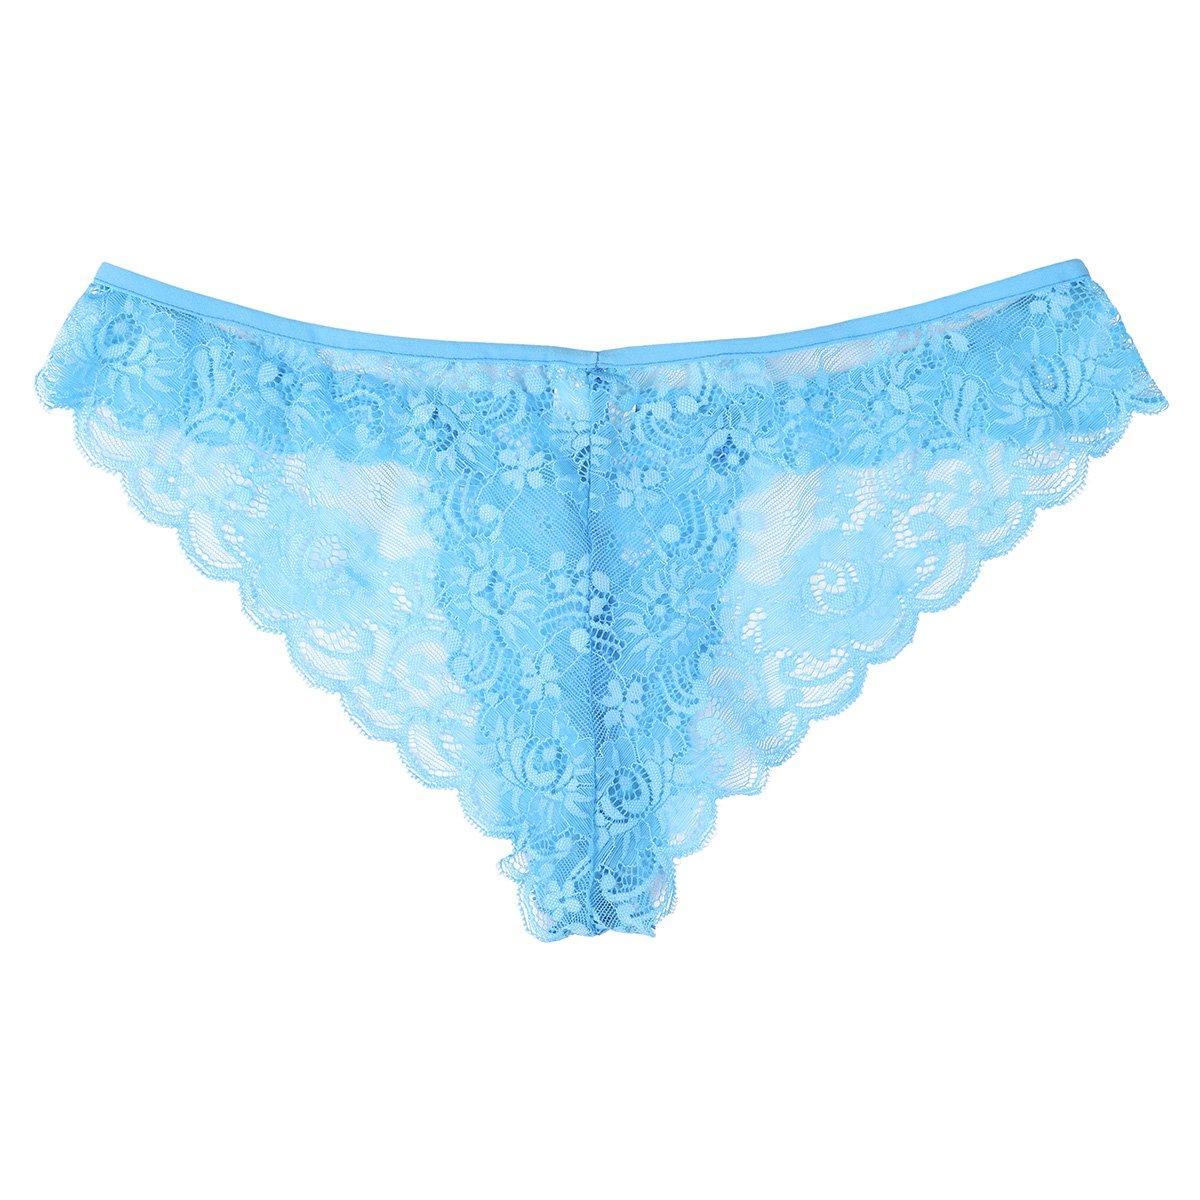 Freebily Sissy Men's Floral Lace See Through Underwear Low Rise Tanga Crossdress Panties Sky Blue X-Large(Waist:31.5-47.0''/80-118cm)